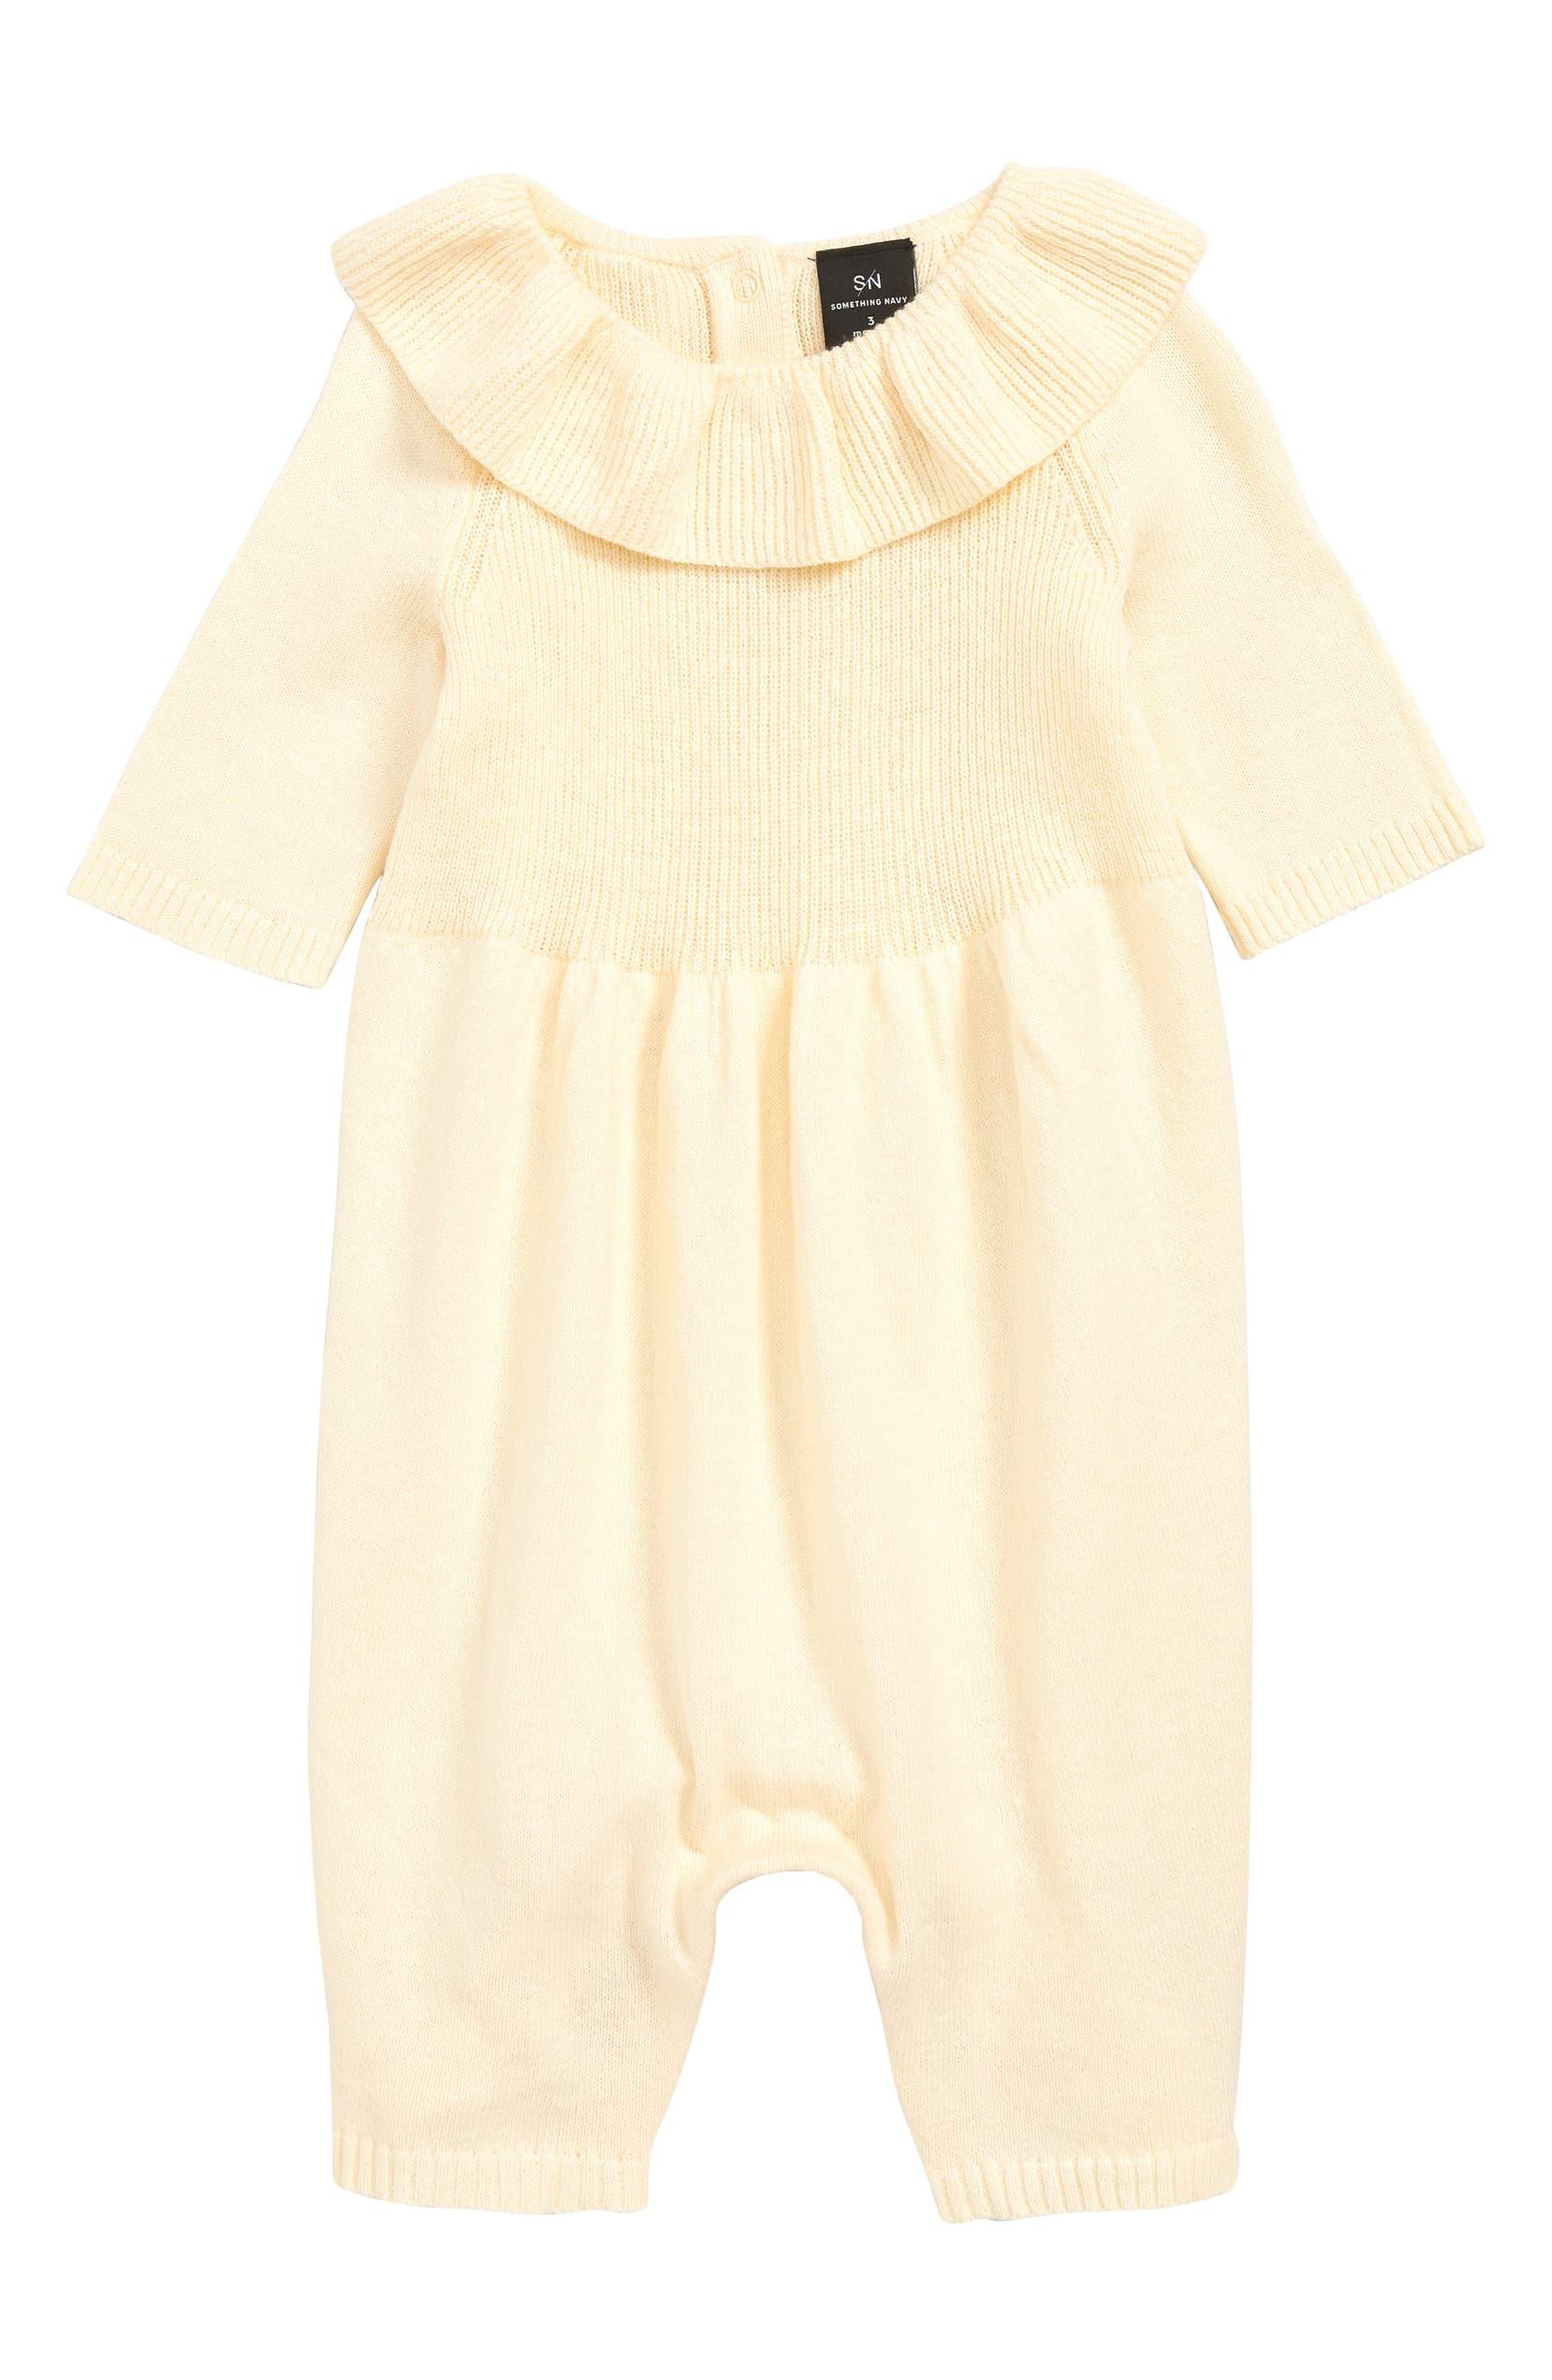 2717fb8500 Something Navy Flounce Neck Romper (Baby) (Nordstrom Exclusive ...